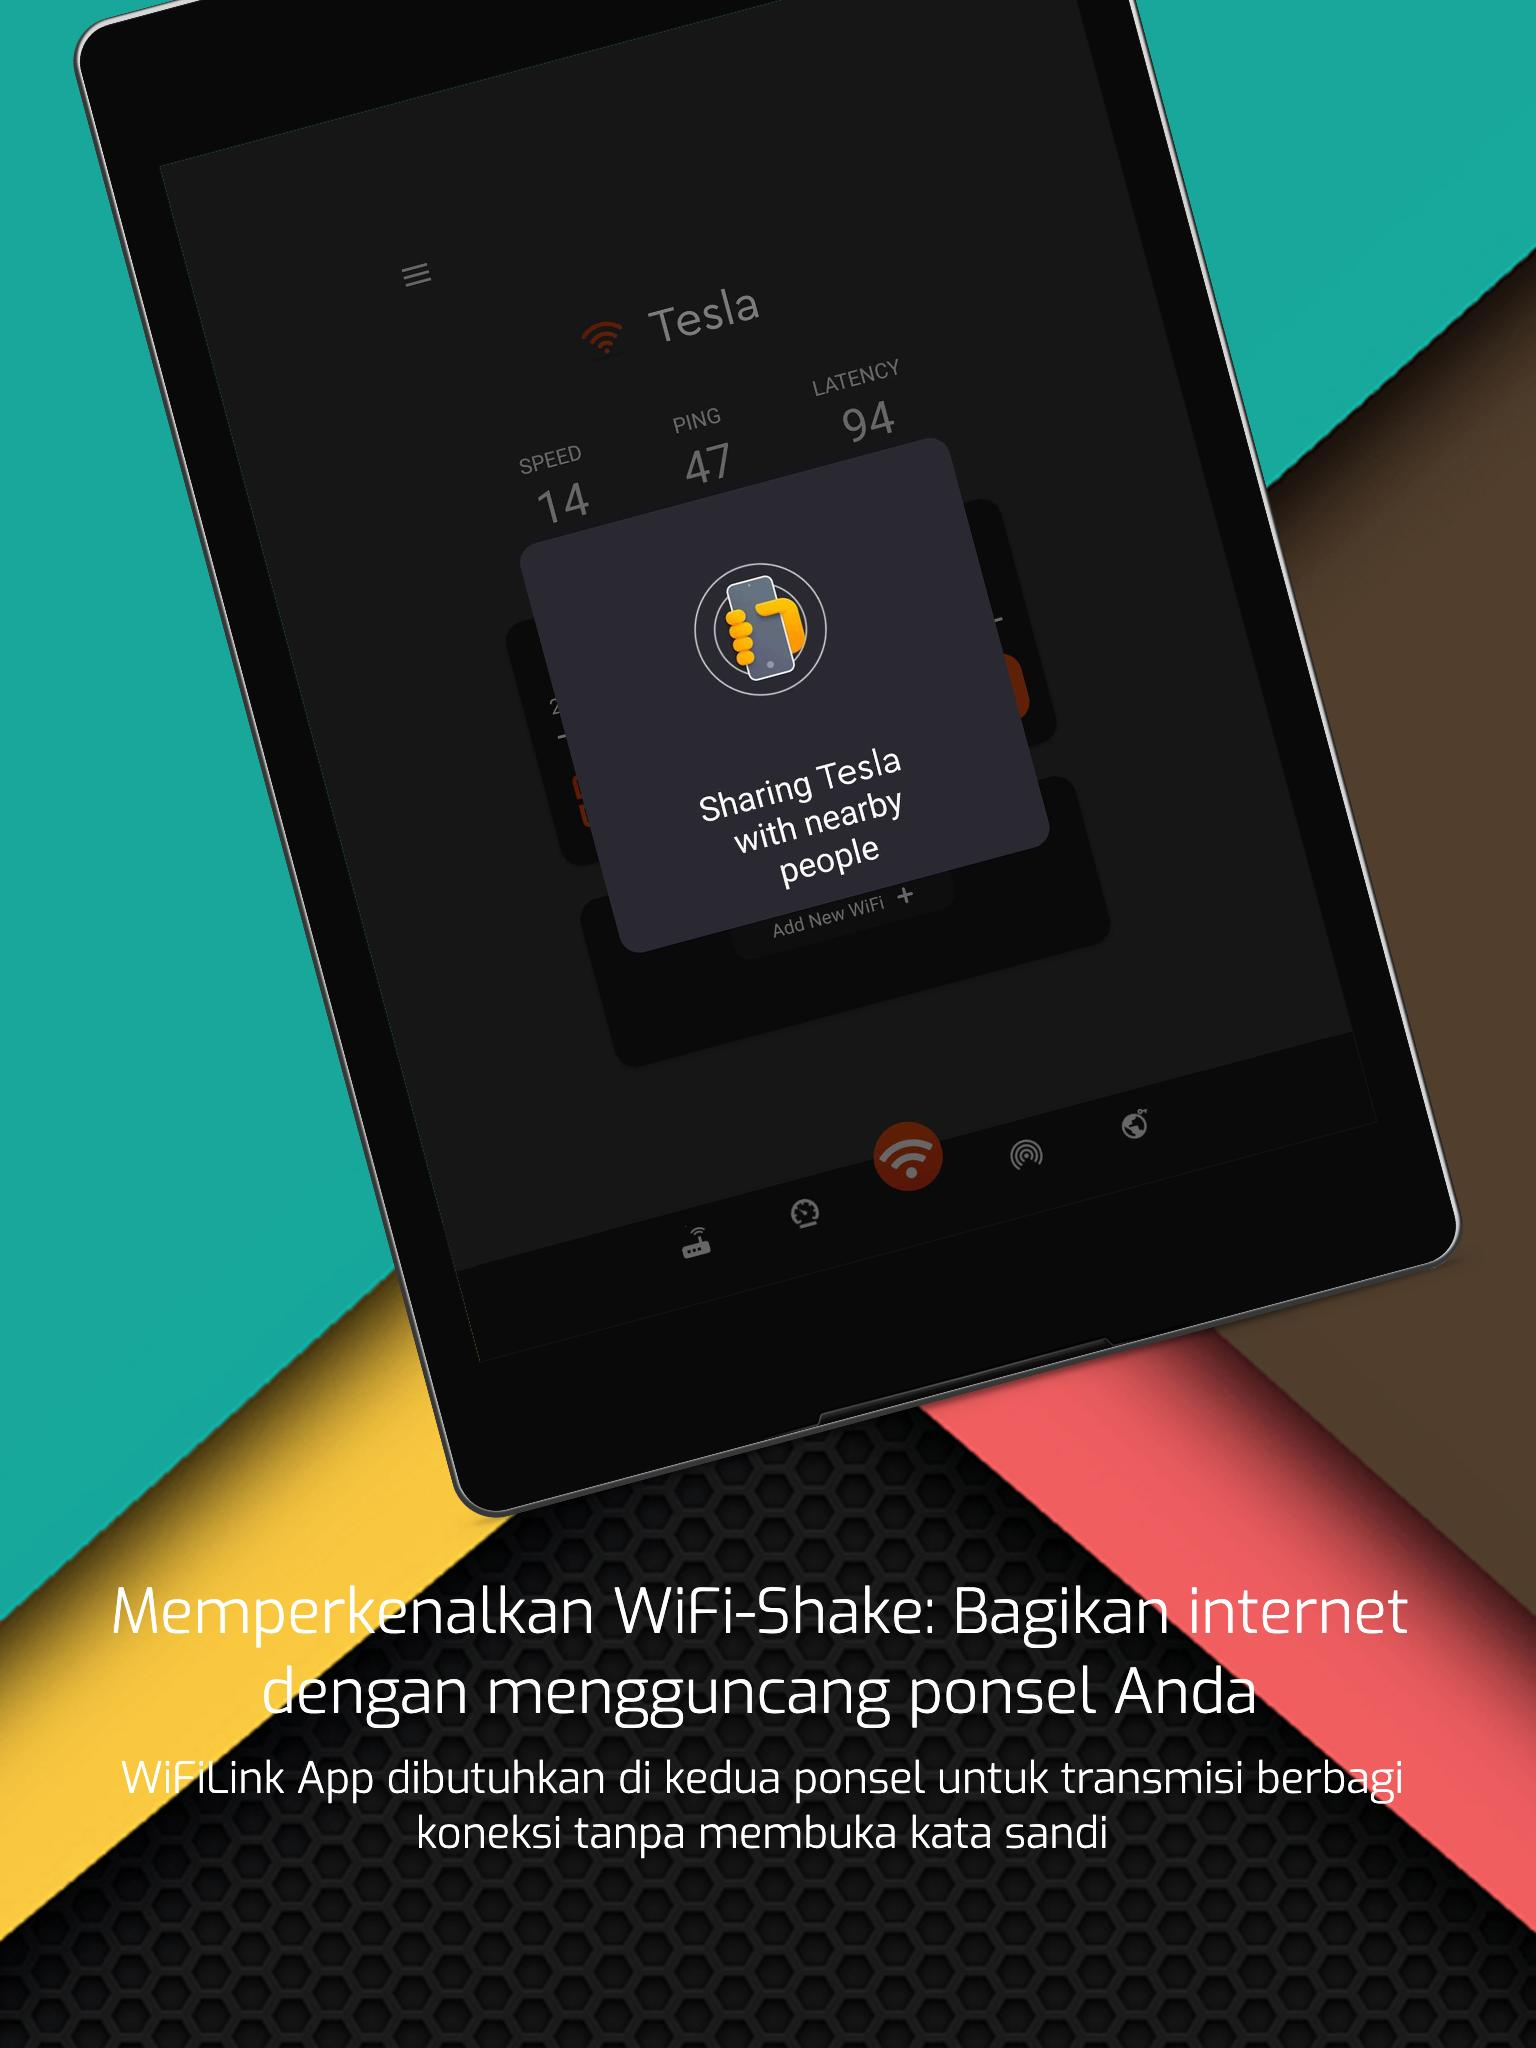 WifiLink-Share-WiFi